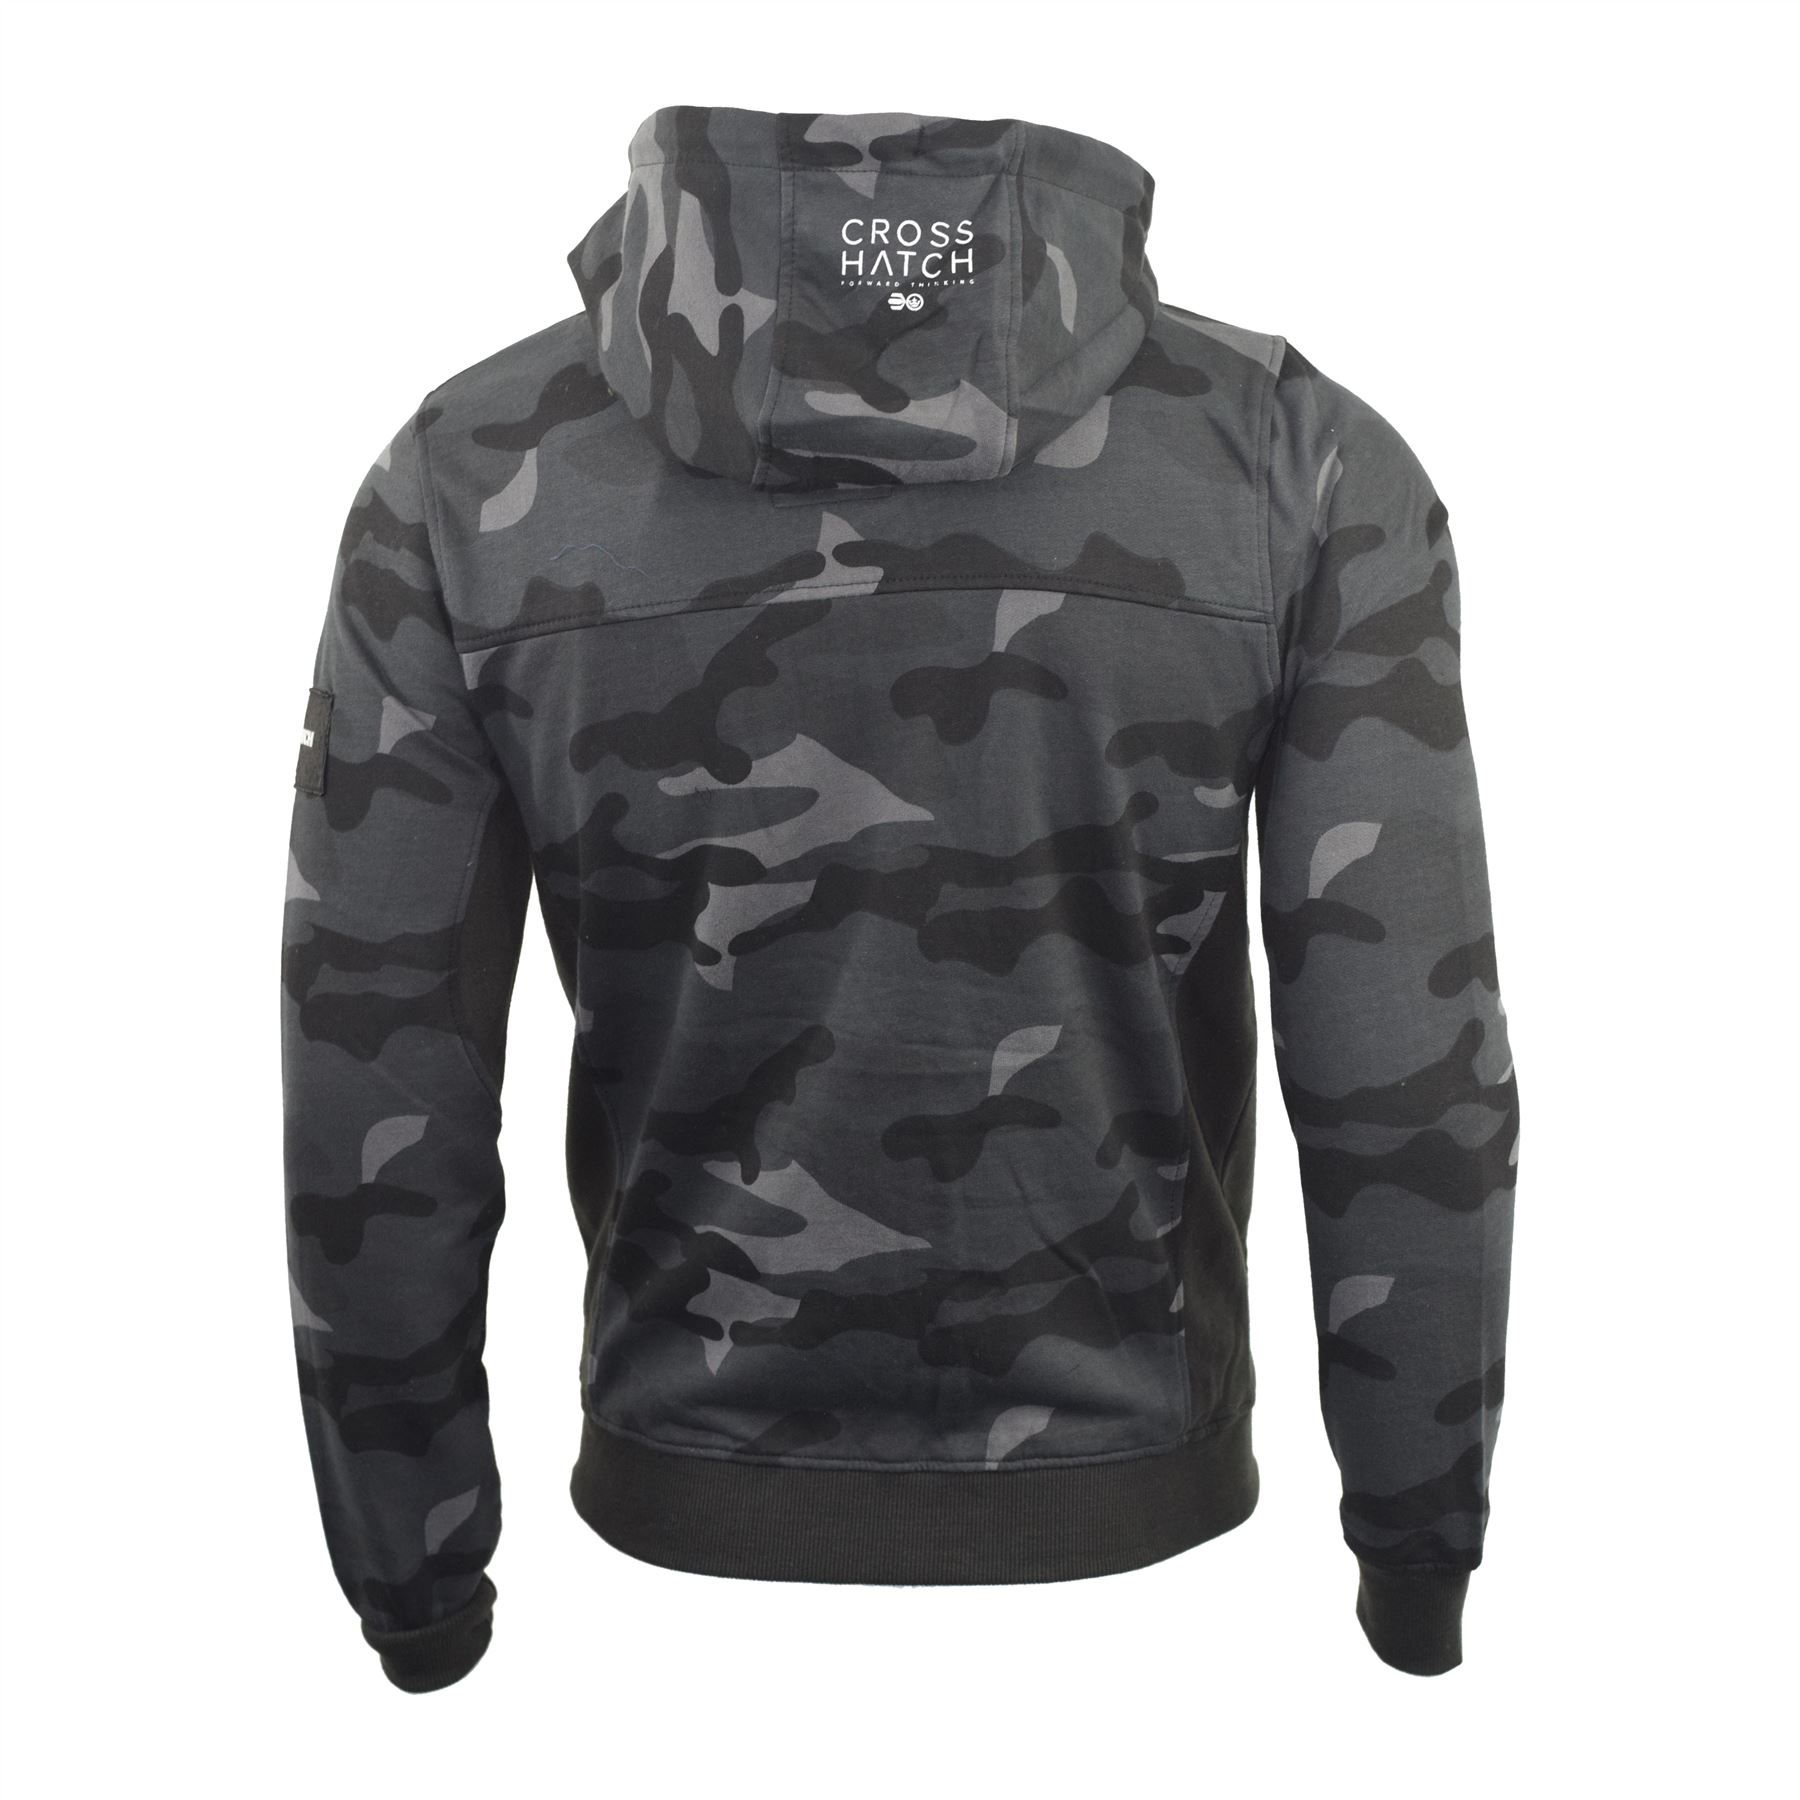 Mens-Hoodie-Crosshatch-Camo-Sweatshirt-Full-Zip-Hooded-Jumper-Top-Pullover-JAGA thumbnail 4